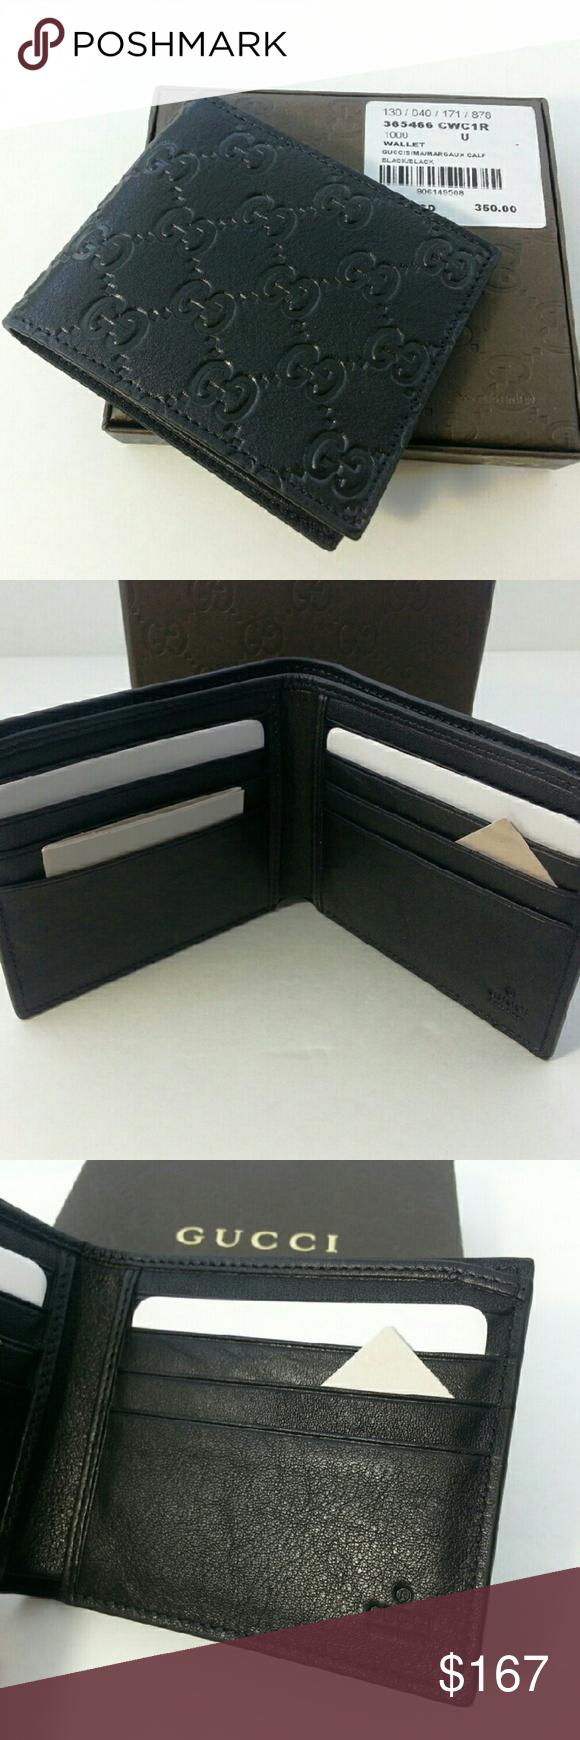 670745cbcba GUCCI Original Mens Black Bi fold Wallet W04 GUCCI Original Authentic Mens  Black Bi fold Guccisima